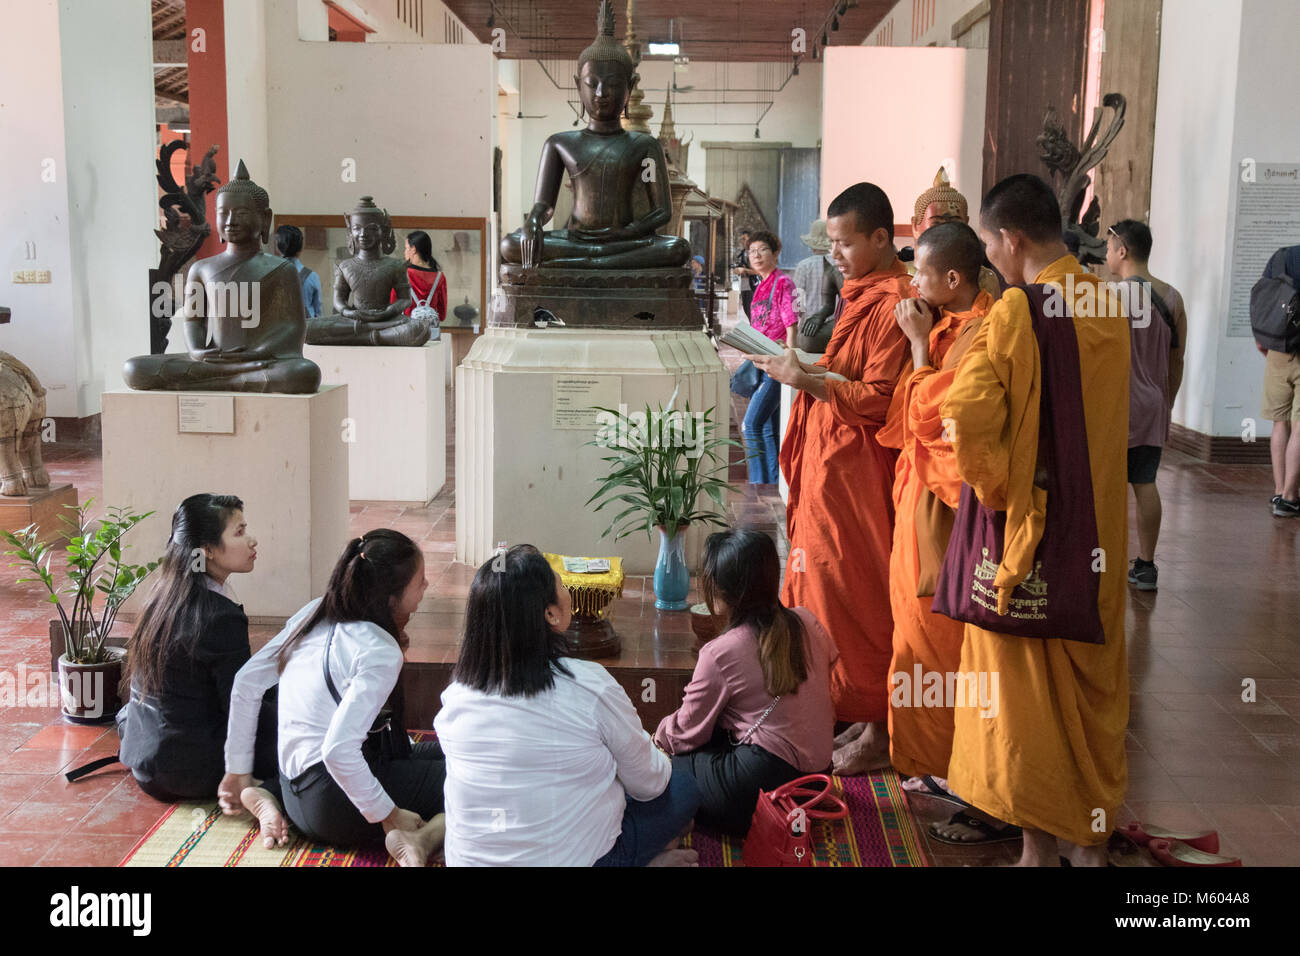 Cambodia Monks talking to schoolchildren in the National  Museum of Cambodia, Phnom Penh, Cambodia, Asia - Stock Image